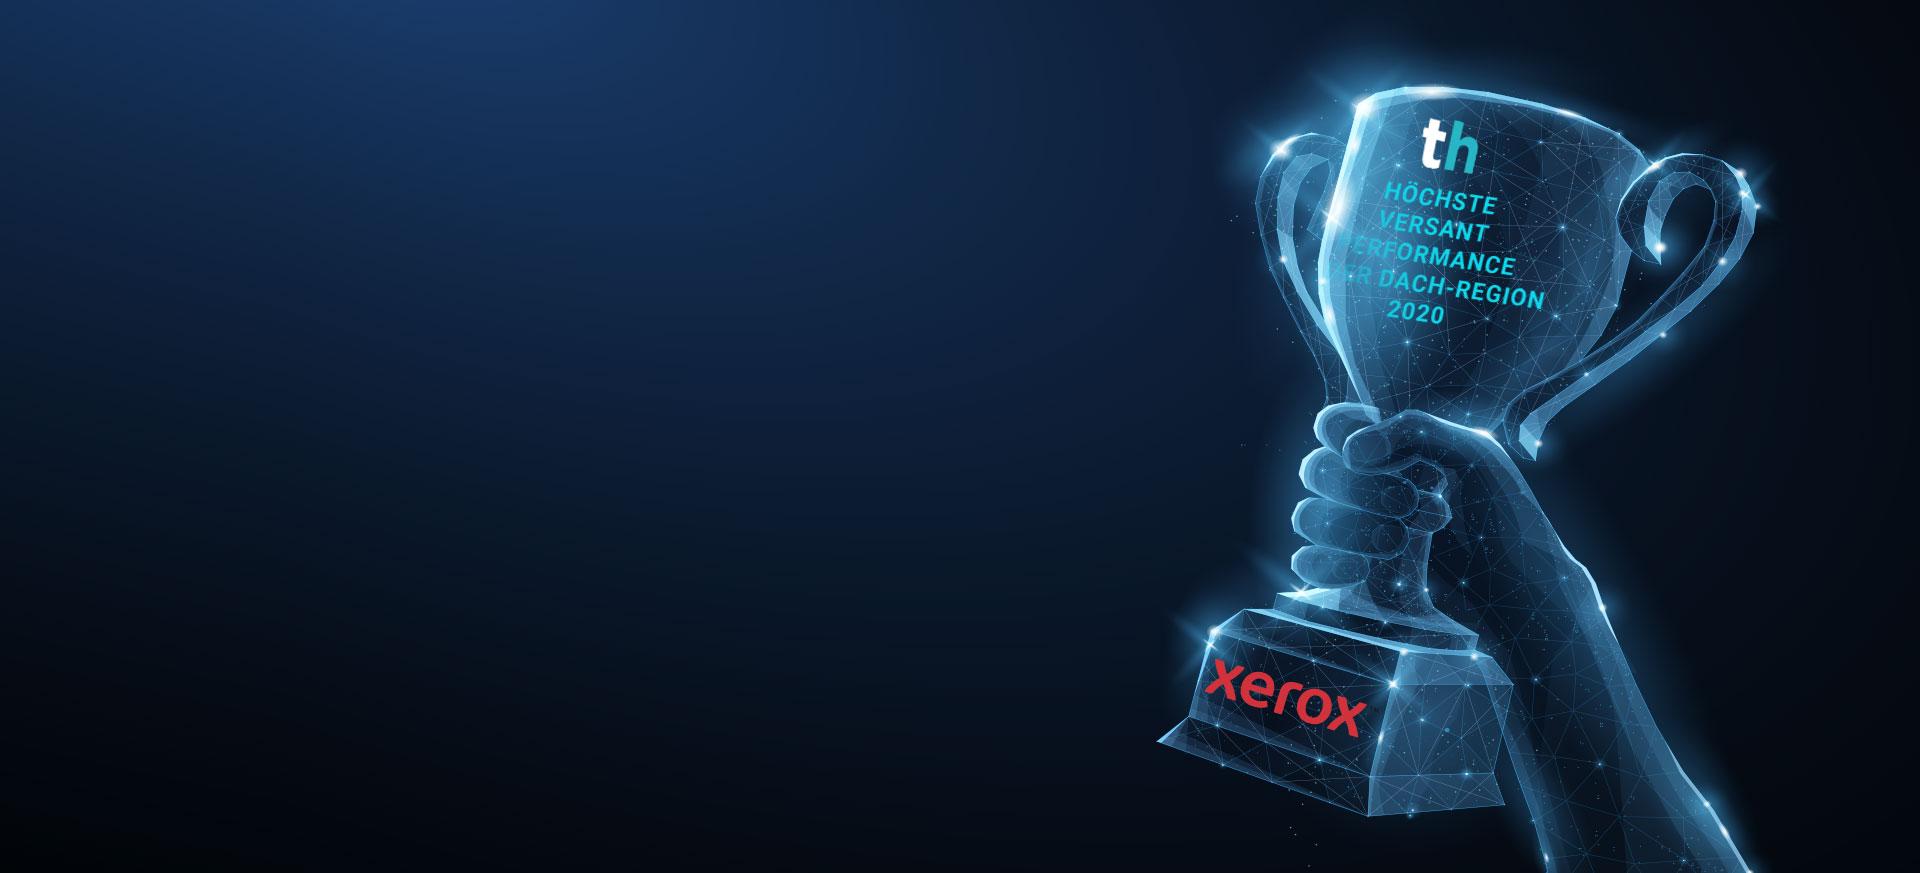 Zum 3. Mal: Bester Xerox Partner im Bereich Production